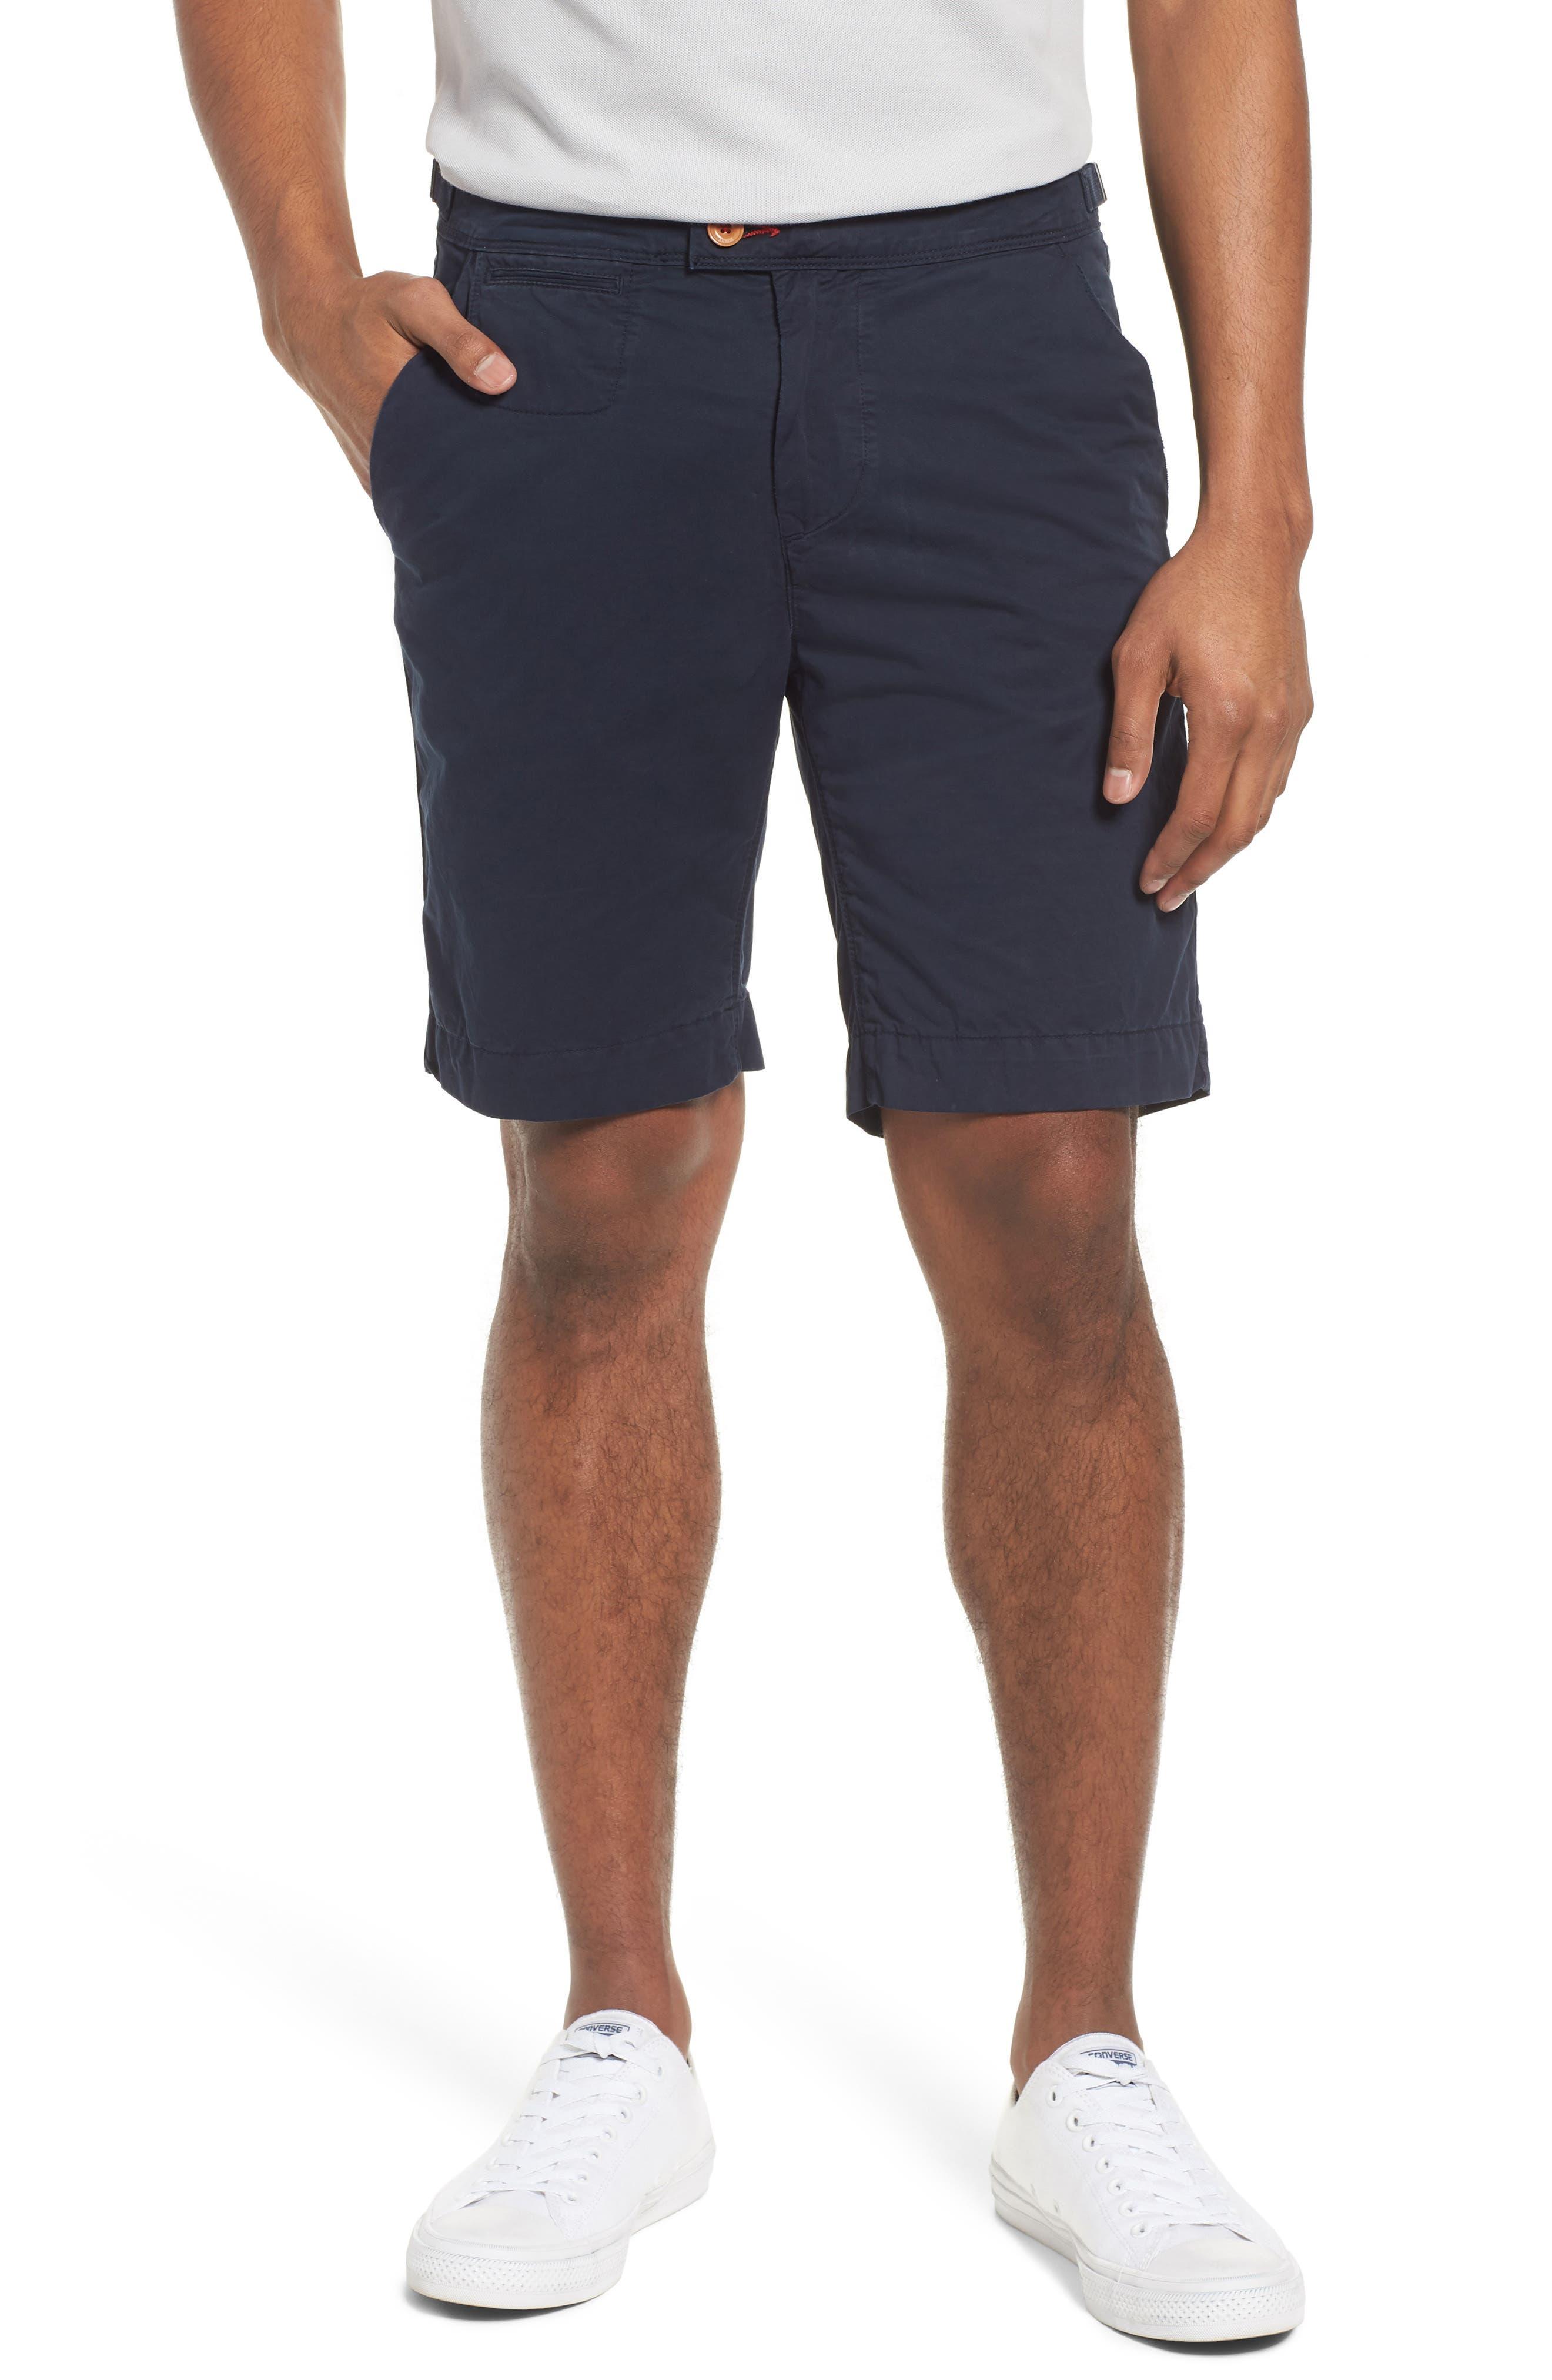 Triumph Shorts,                             Main thumbnail 8, color,